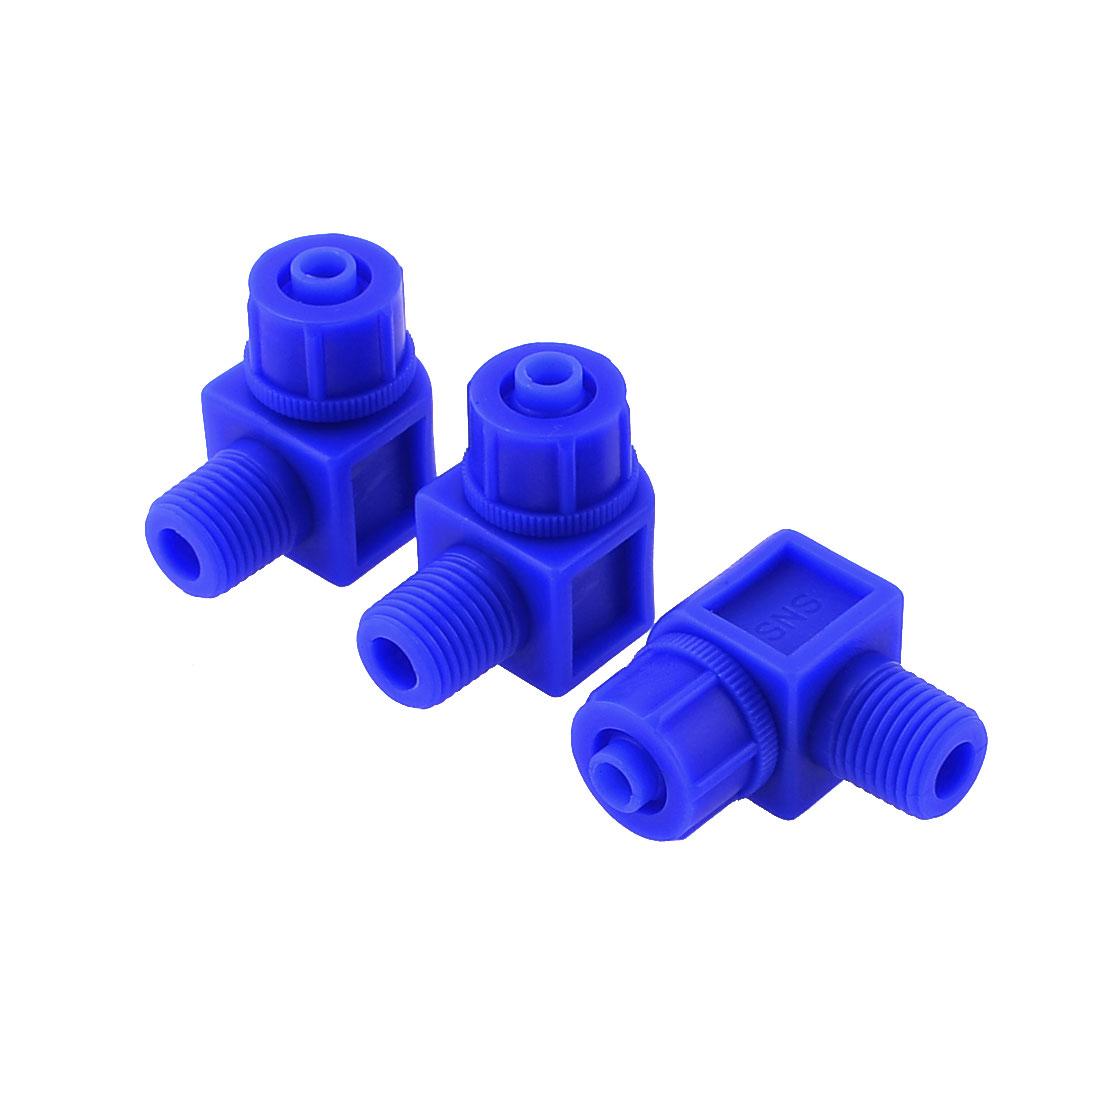 "Pneumatic 1/2"" Thread Diameter Straight Connector Plastic Fitting 3pcs"